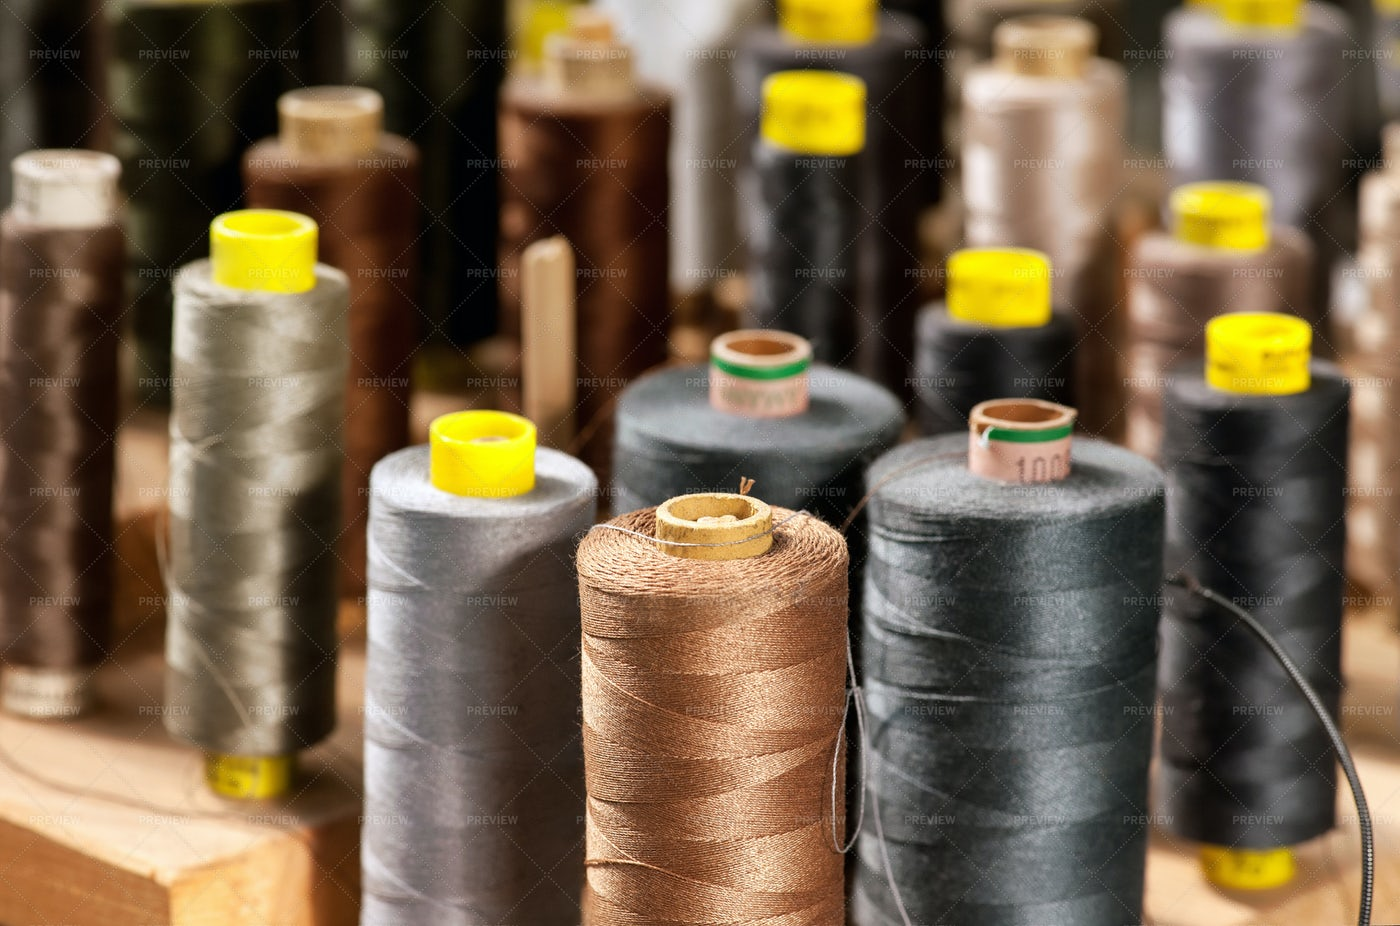 Colored Yarn On Bobbins: Stock Photos